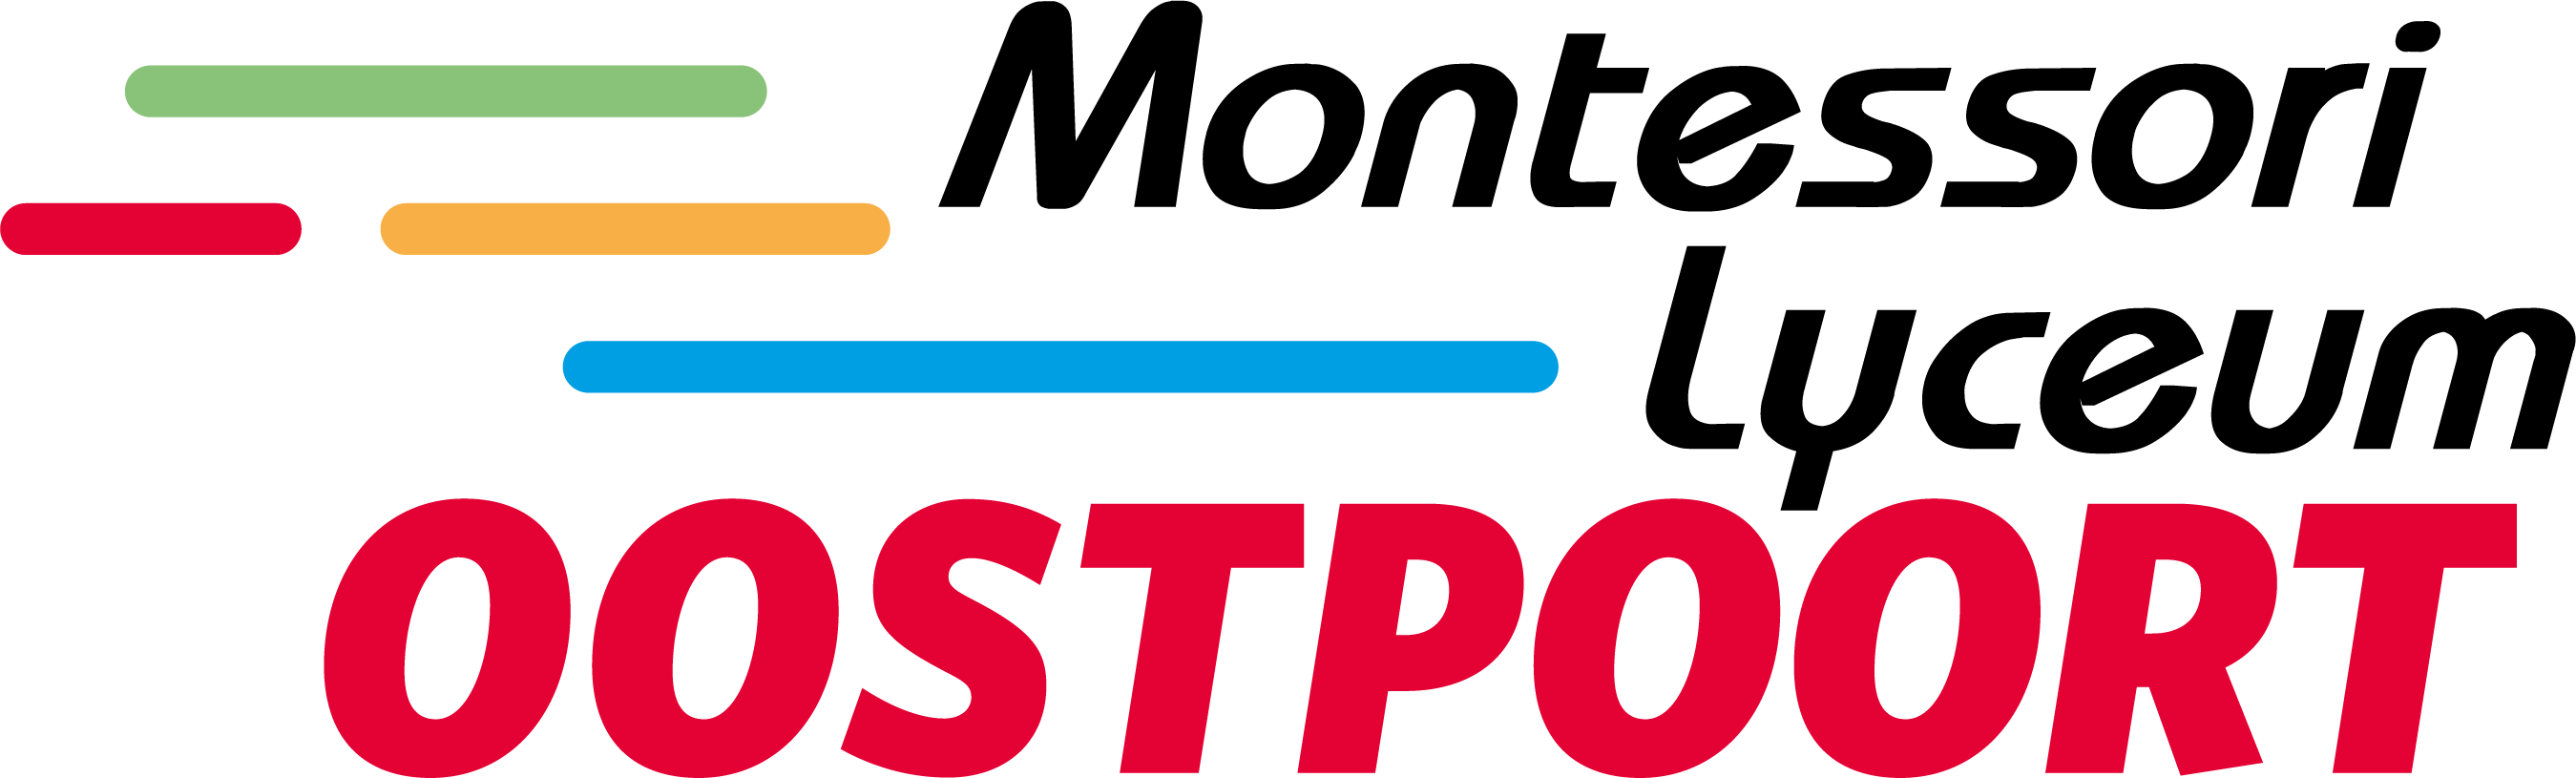 Montessori Lyceum Oostpoort logo